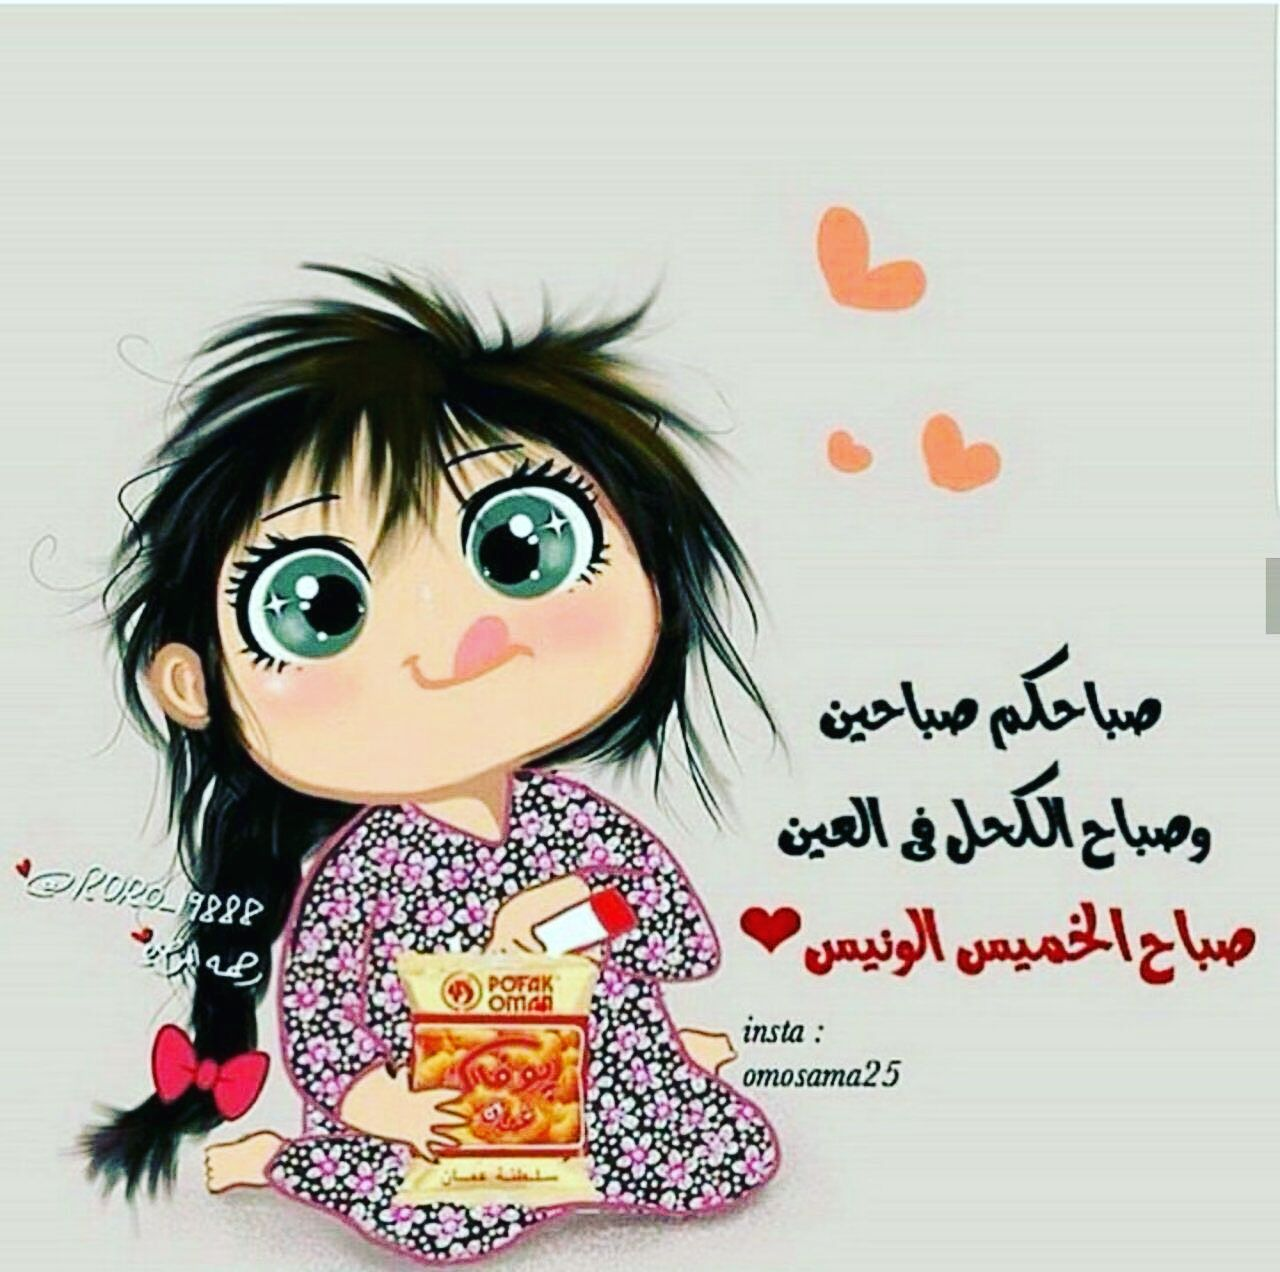 Desertrose صباح الخميس الونيس Morning Greetings Quotes Morning Images Watercolor Wallpaper Iphone